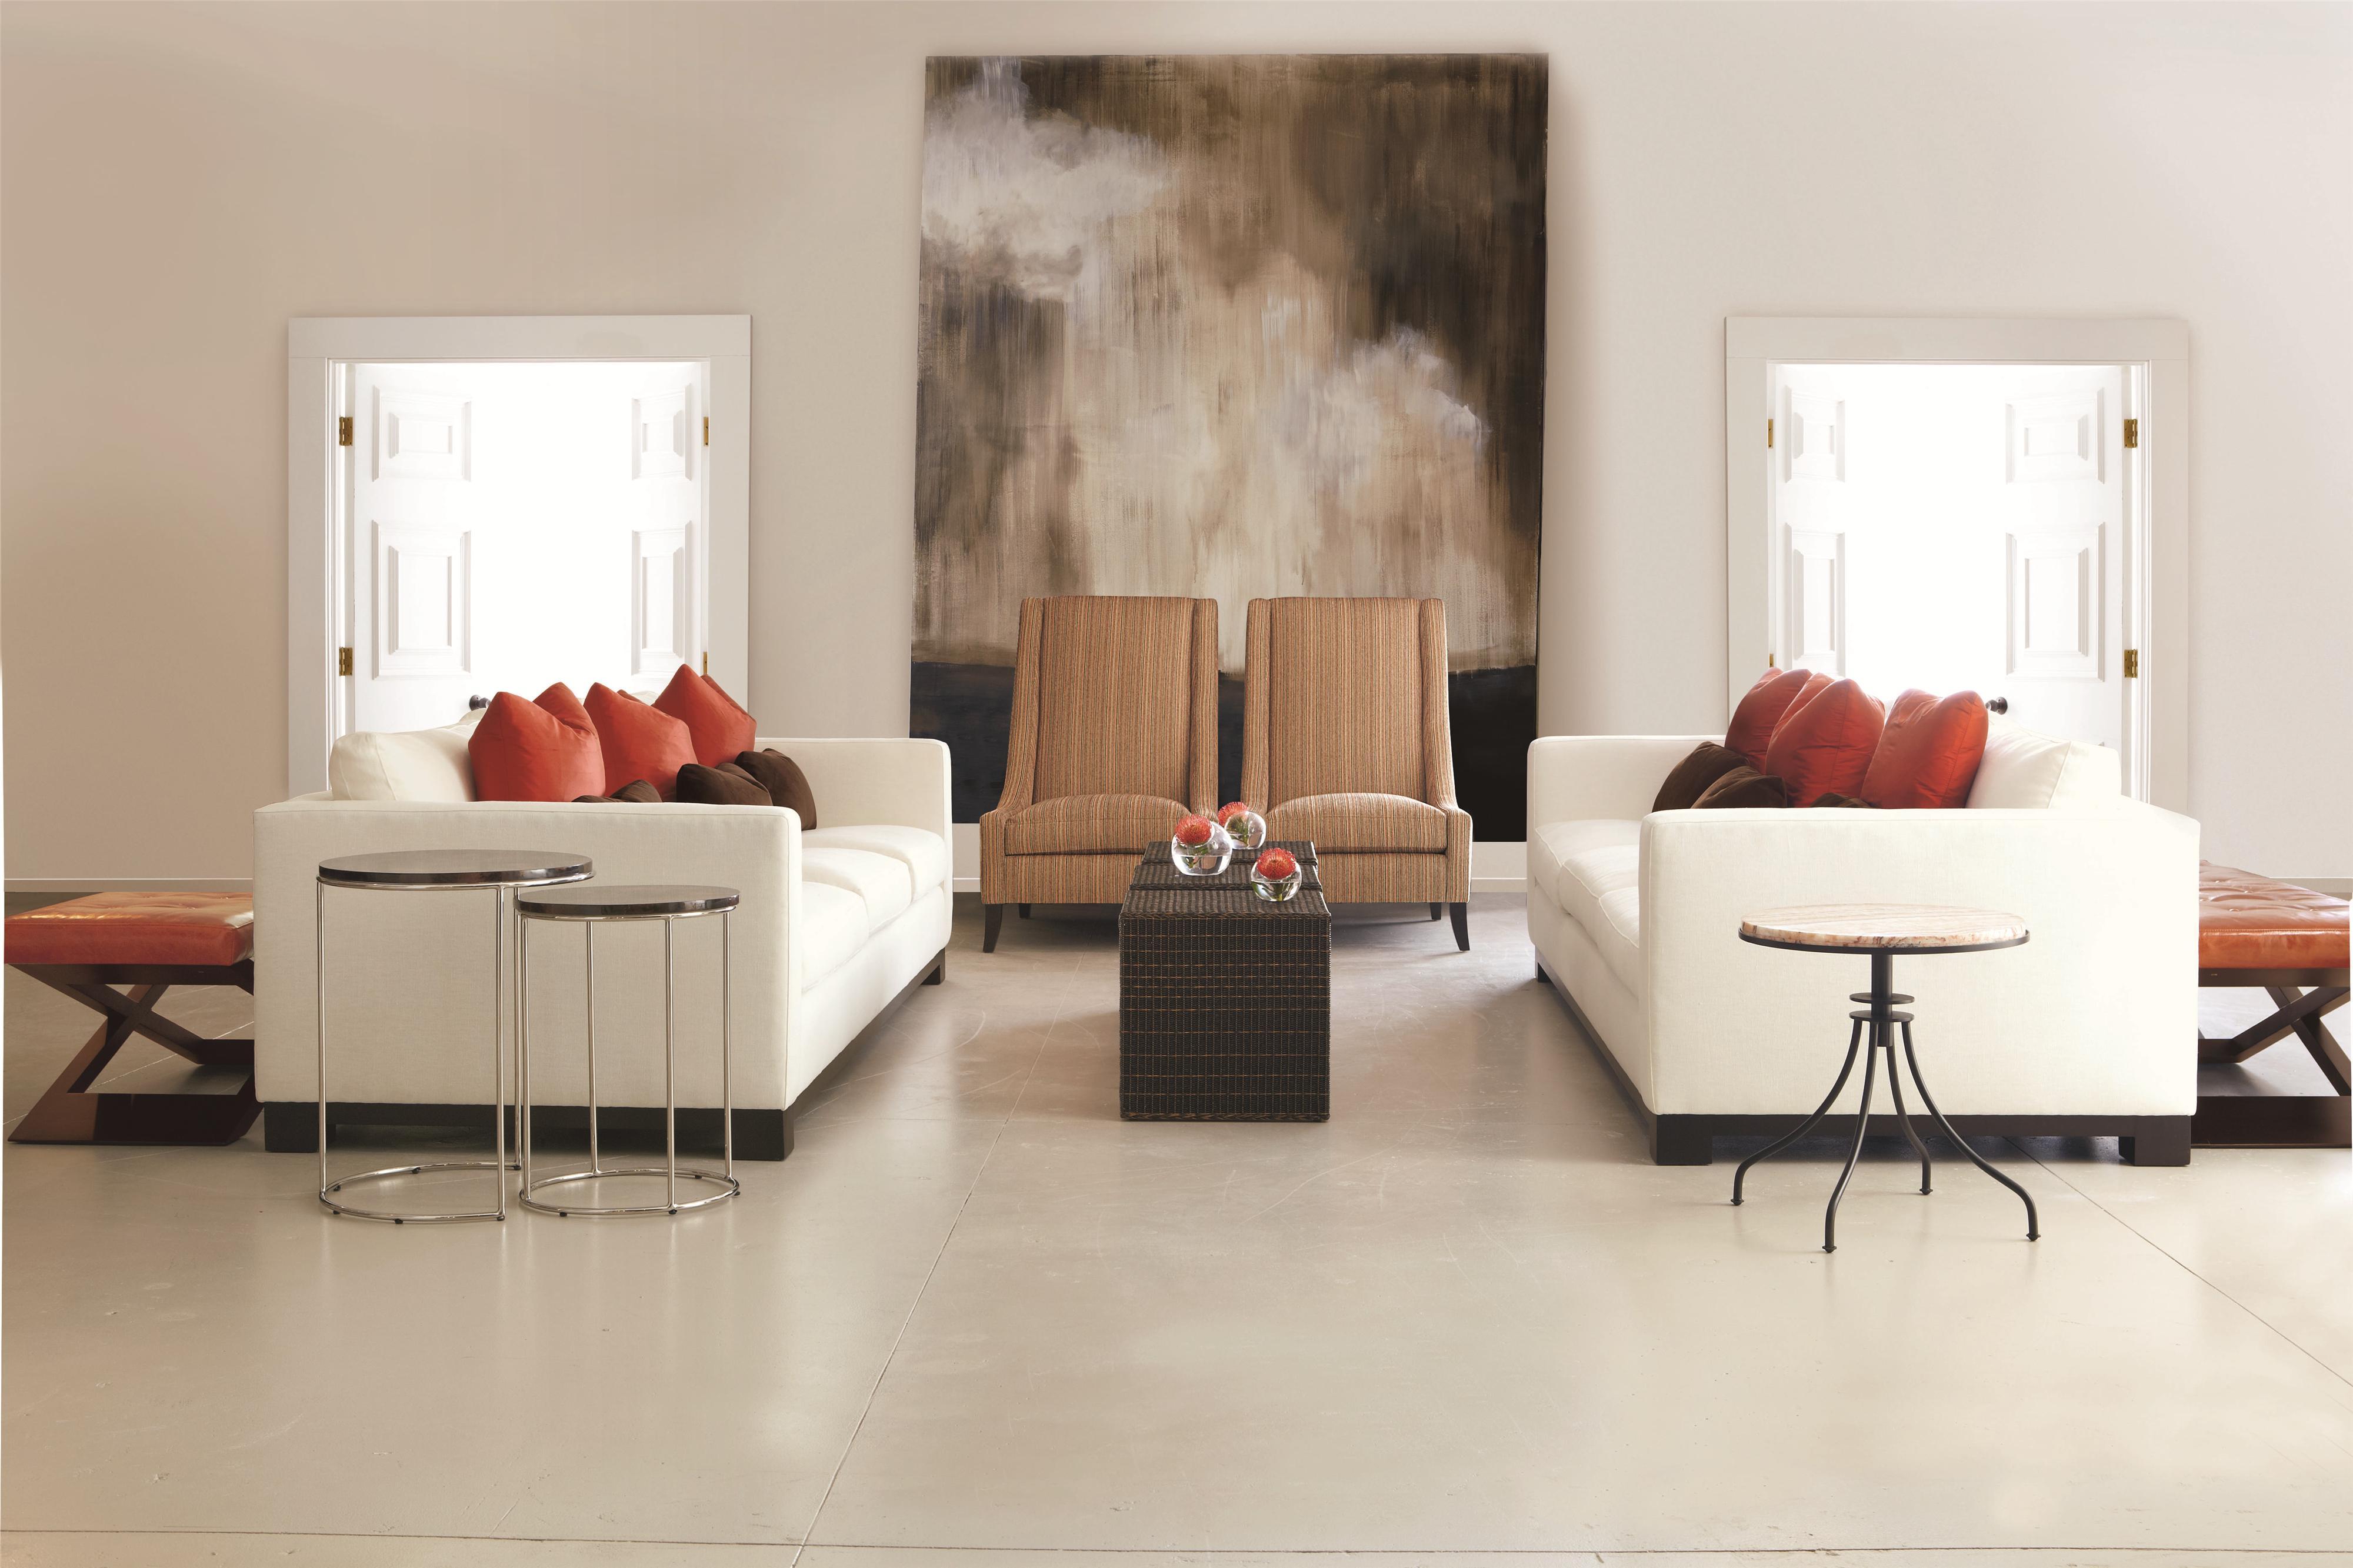 Bernhardt Lanai Modern Styled Sofa with Slight Asian  : products2Fbernhardt2Fcolor2Flanai20n165n1657 b4 from www.jacksonvillefurnituremart.com size 4000 x 2666 jpeg 648kB